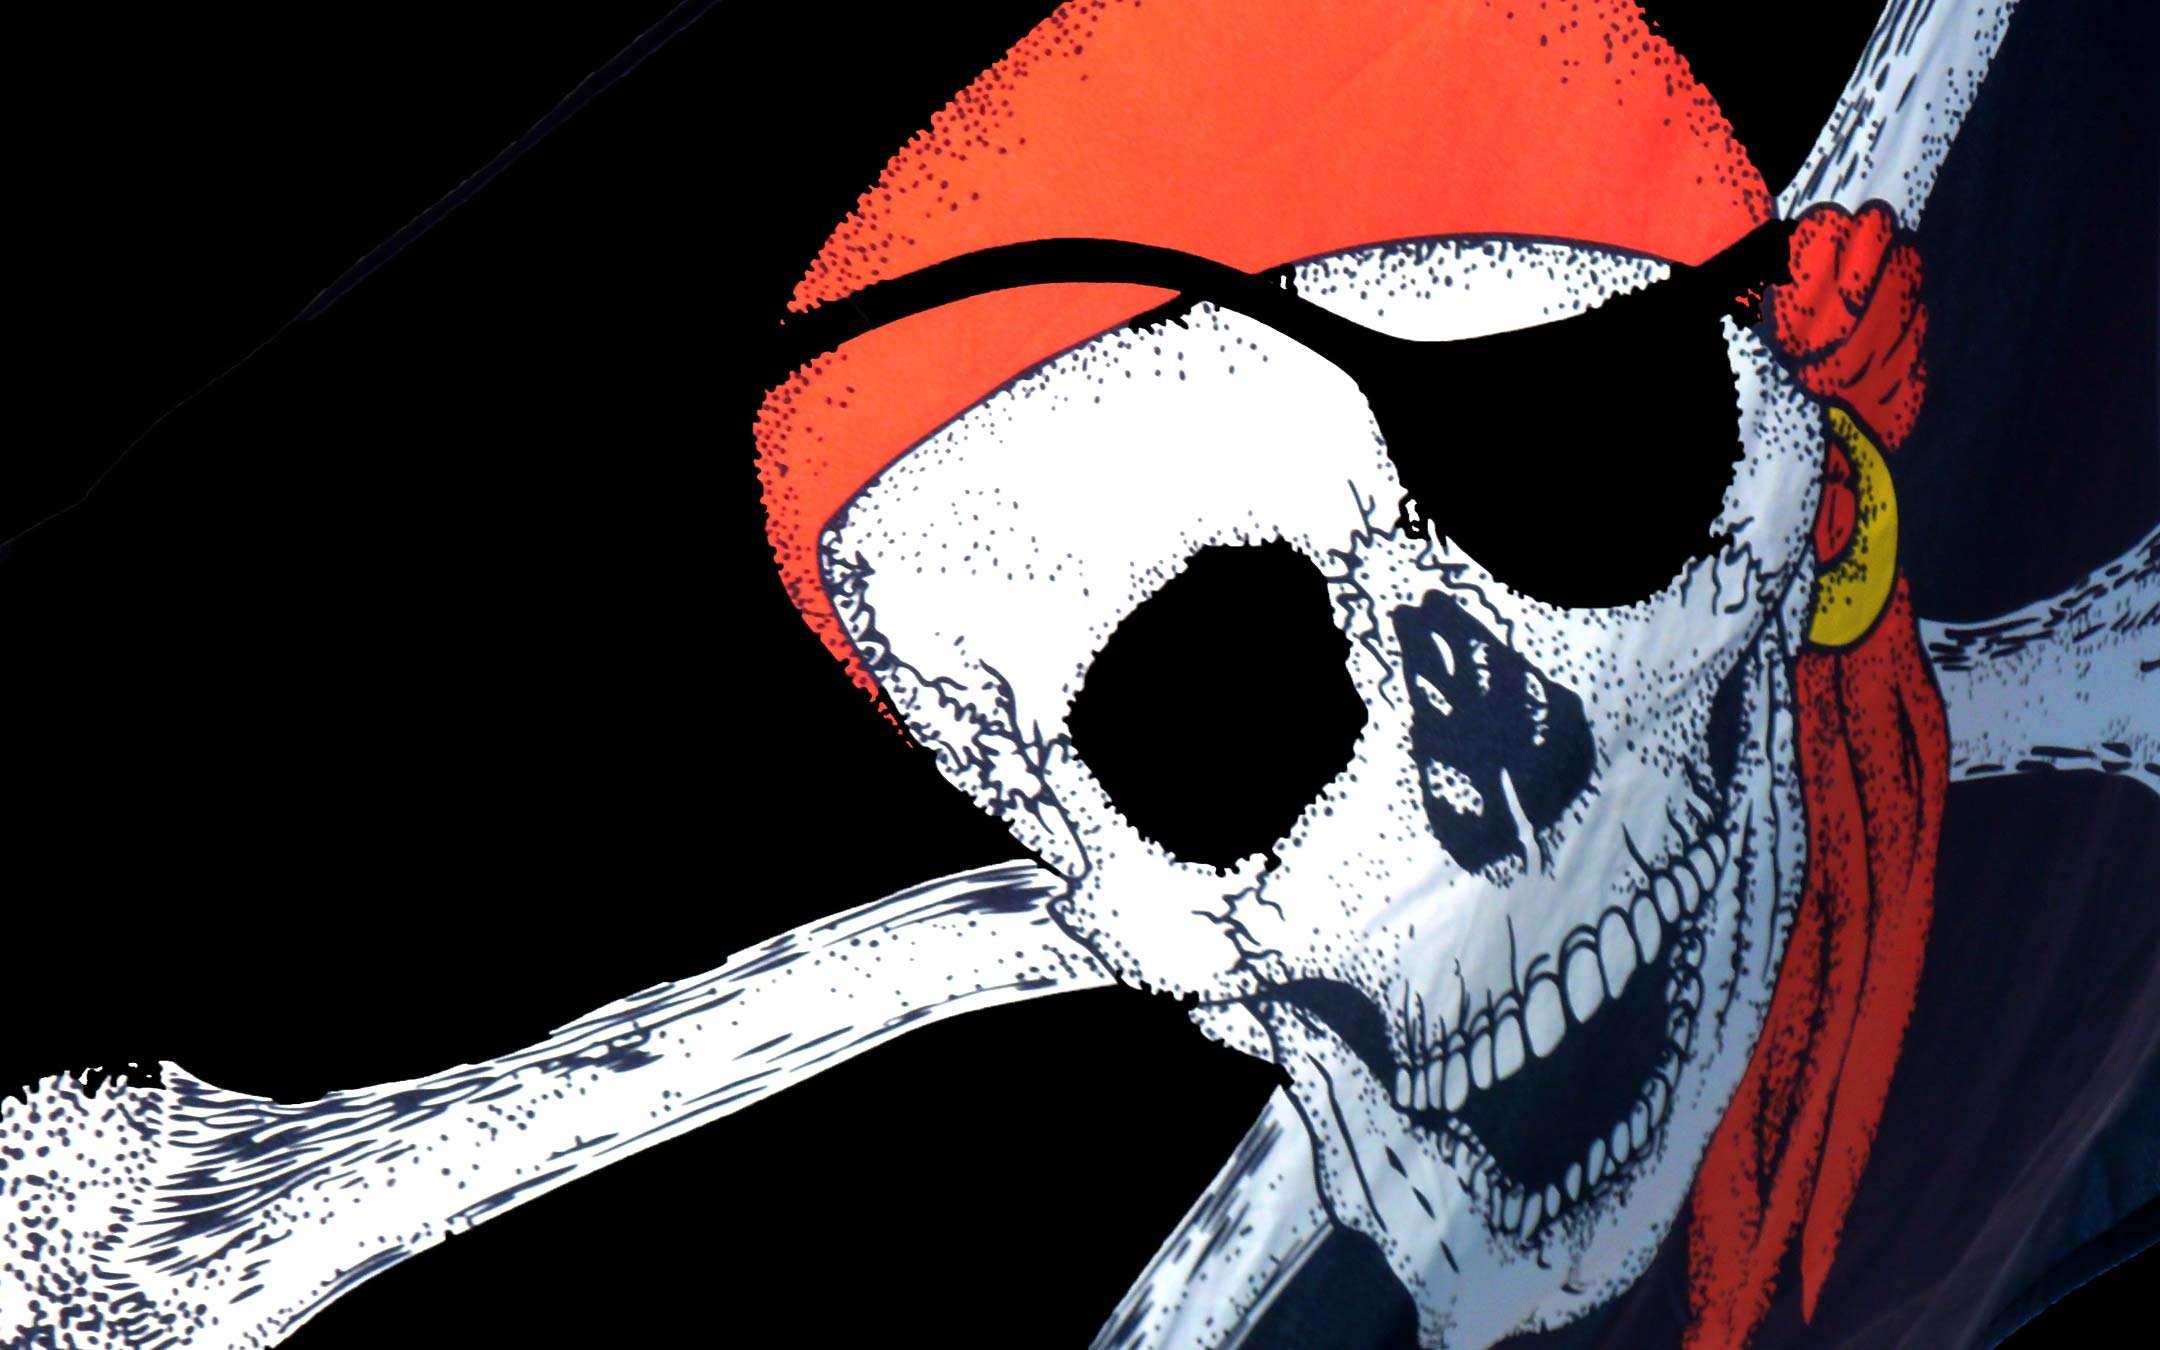 FAPAV: the lockdown has multiplied piracy